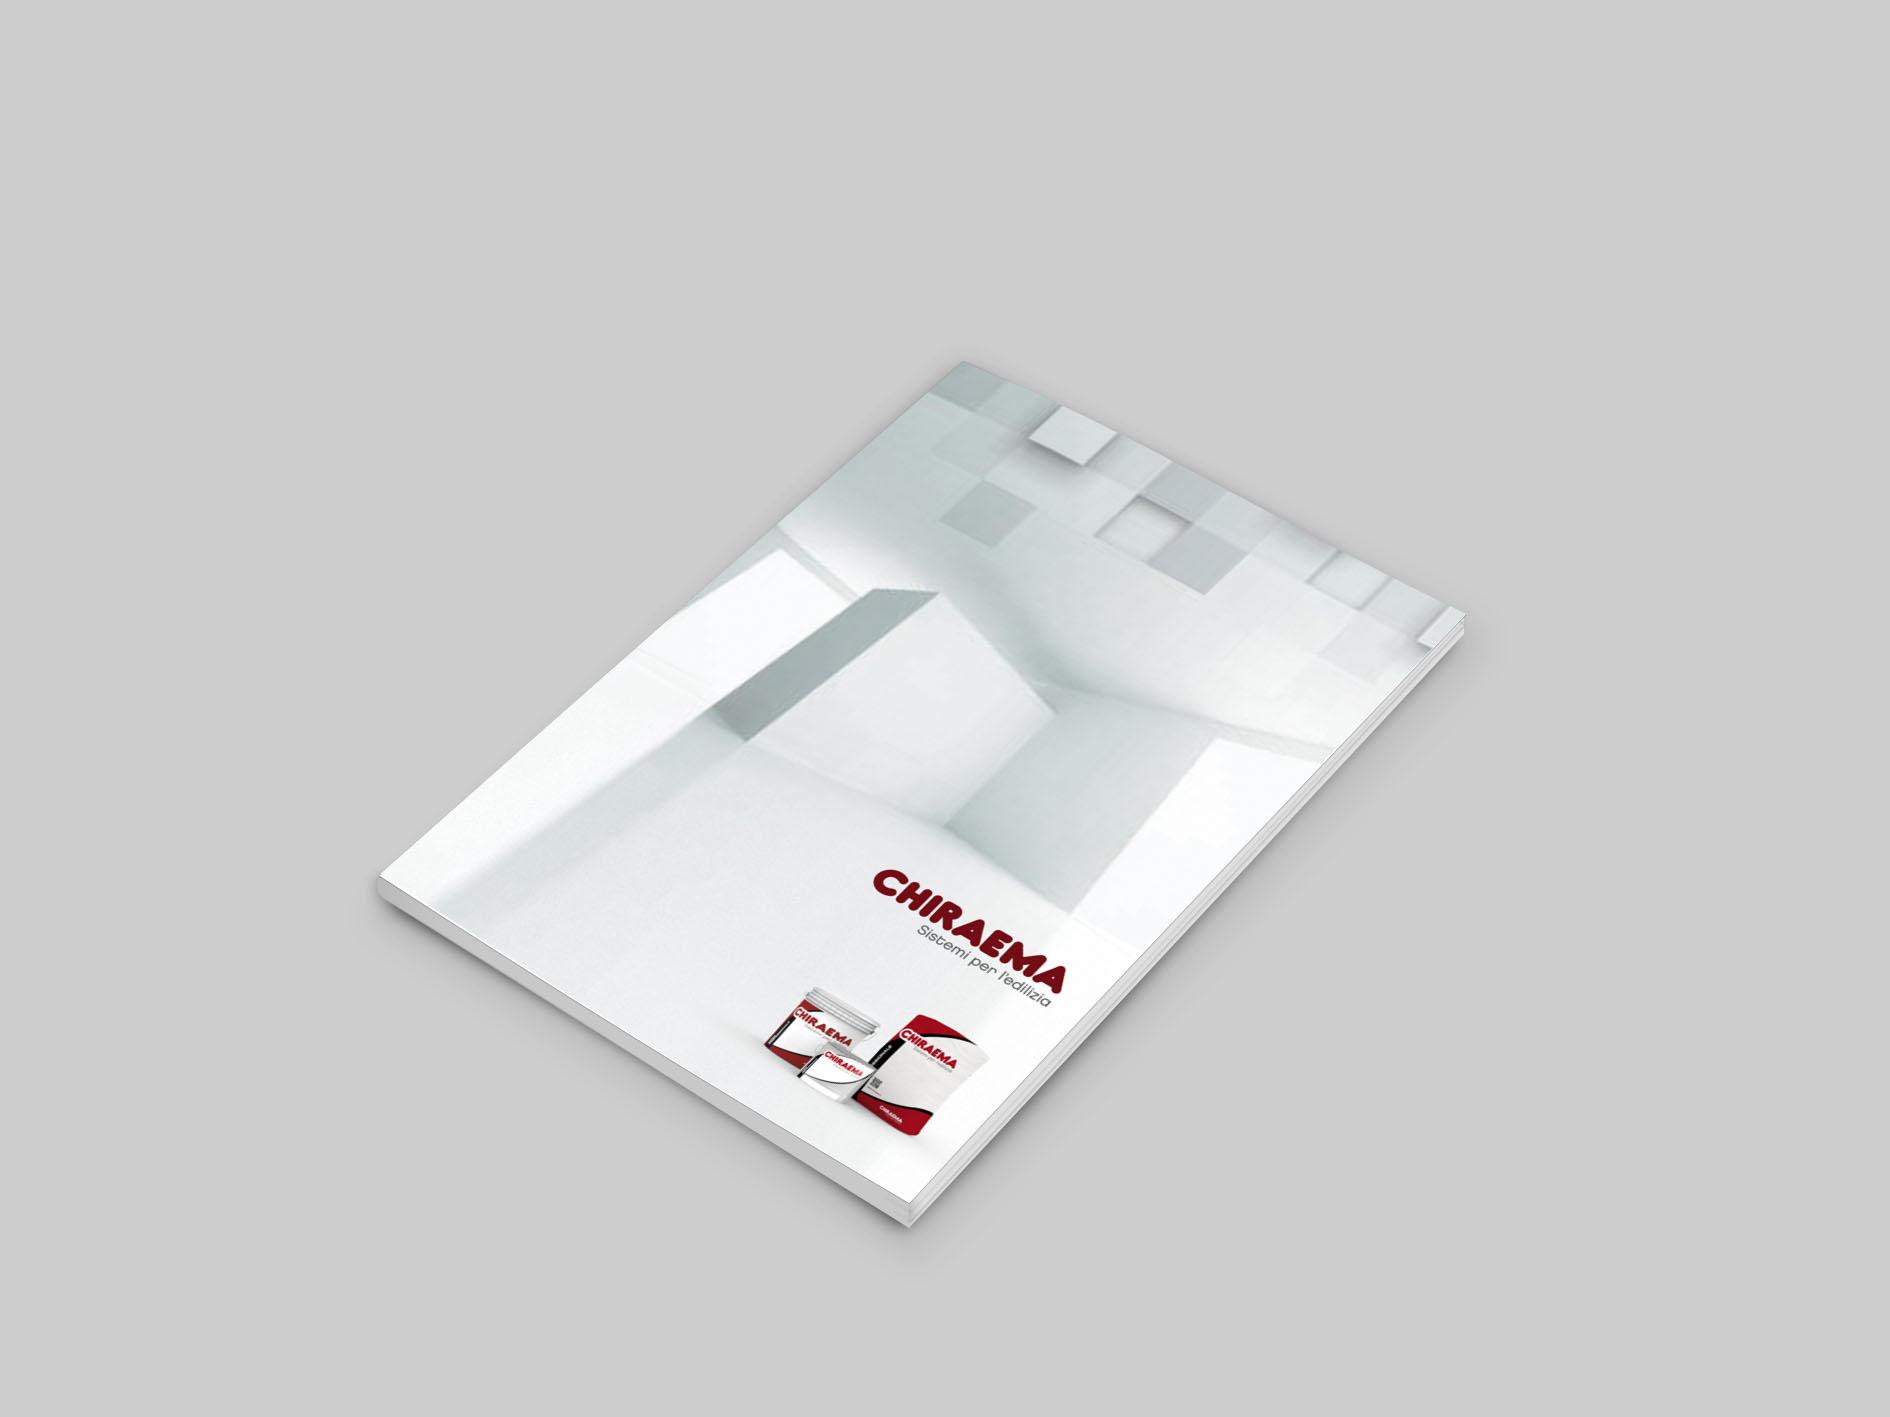 Adduma_Chiraema_company_profile_01